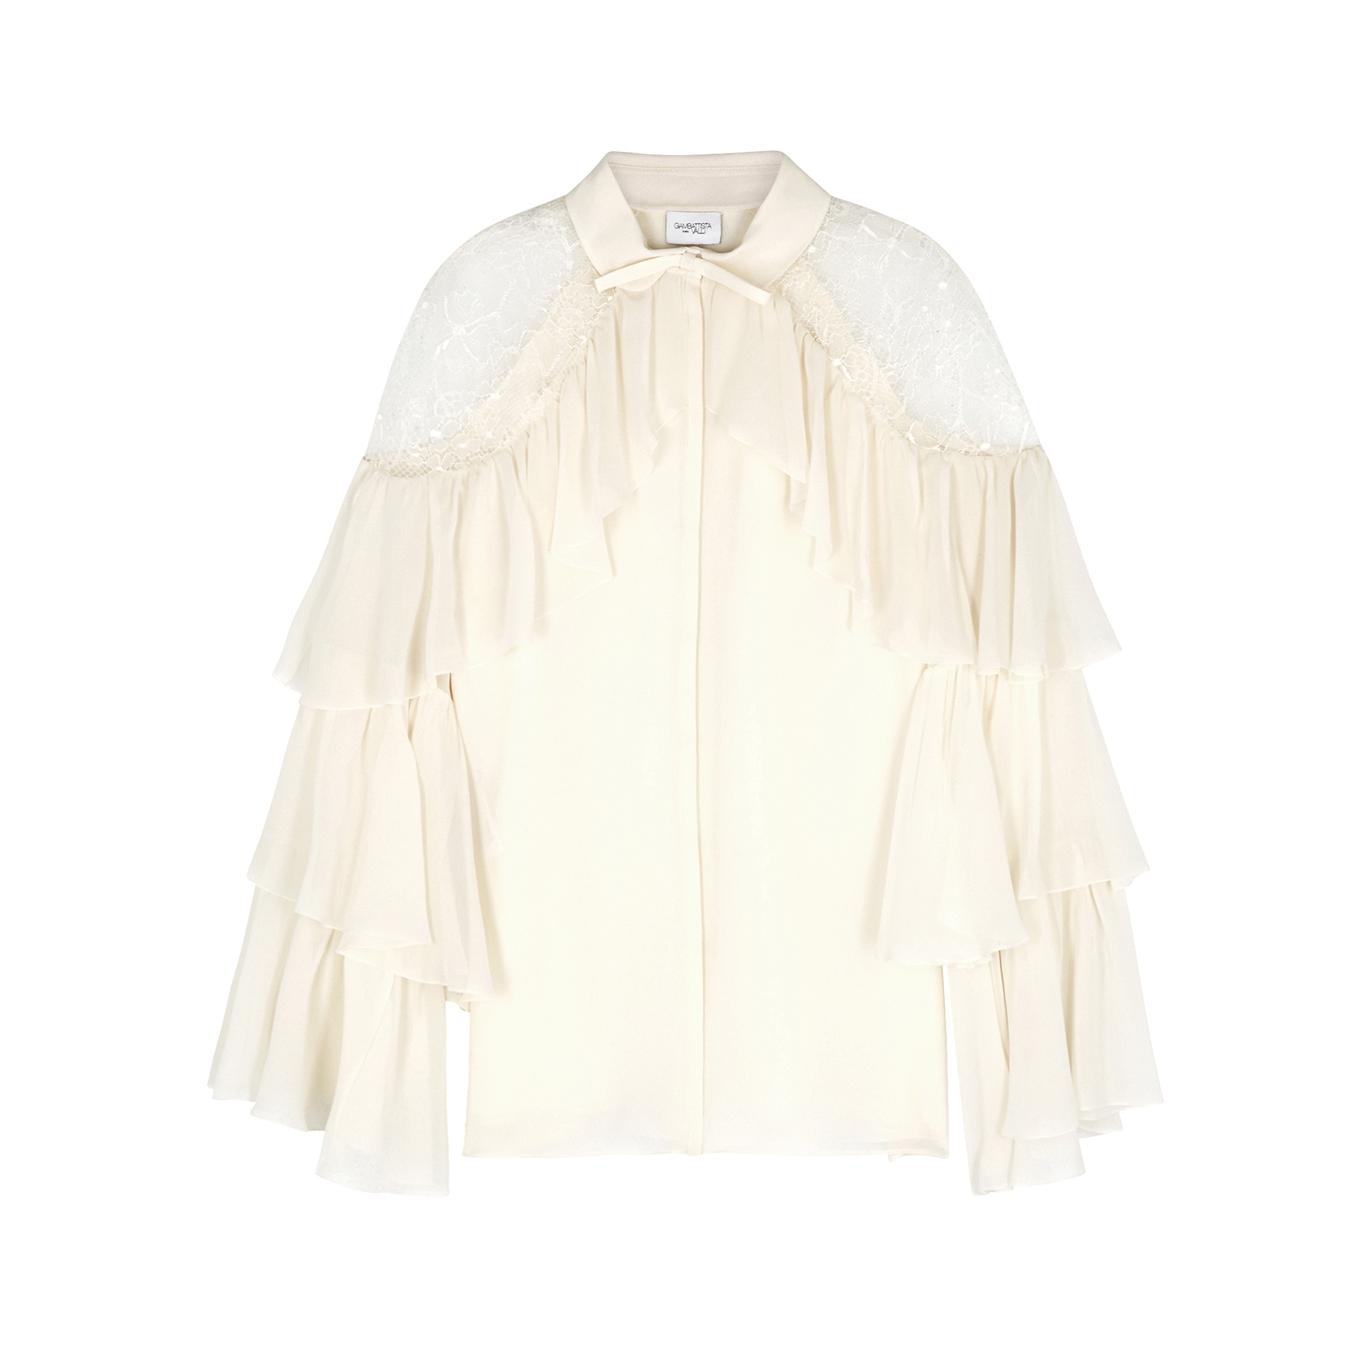 8d4e5c520d26a Giambattista Valli Ivory ruffle-trimmed silk blouse - Harvey Nichols